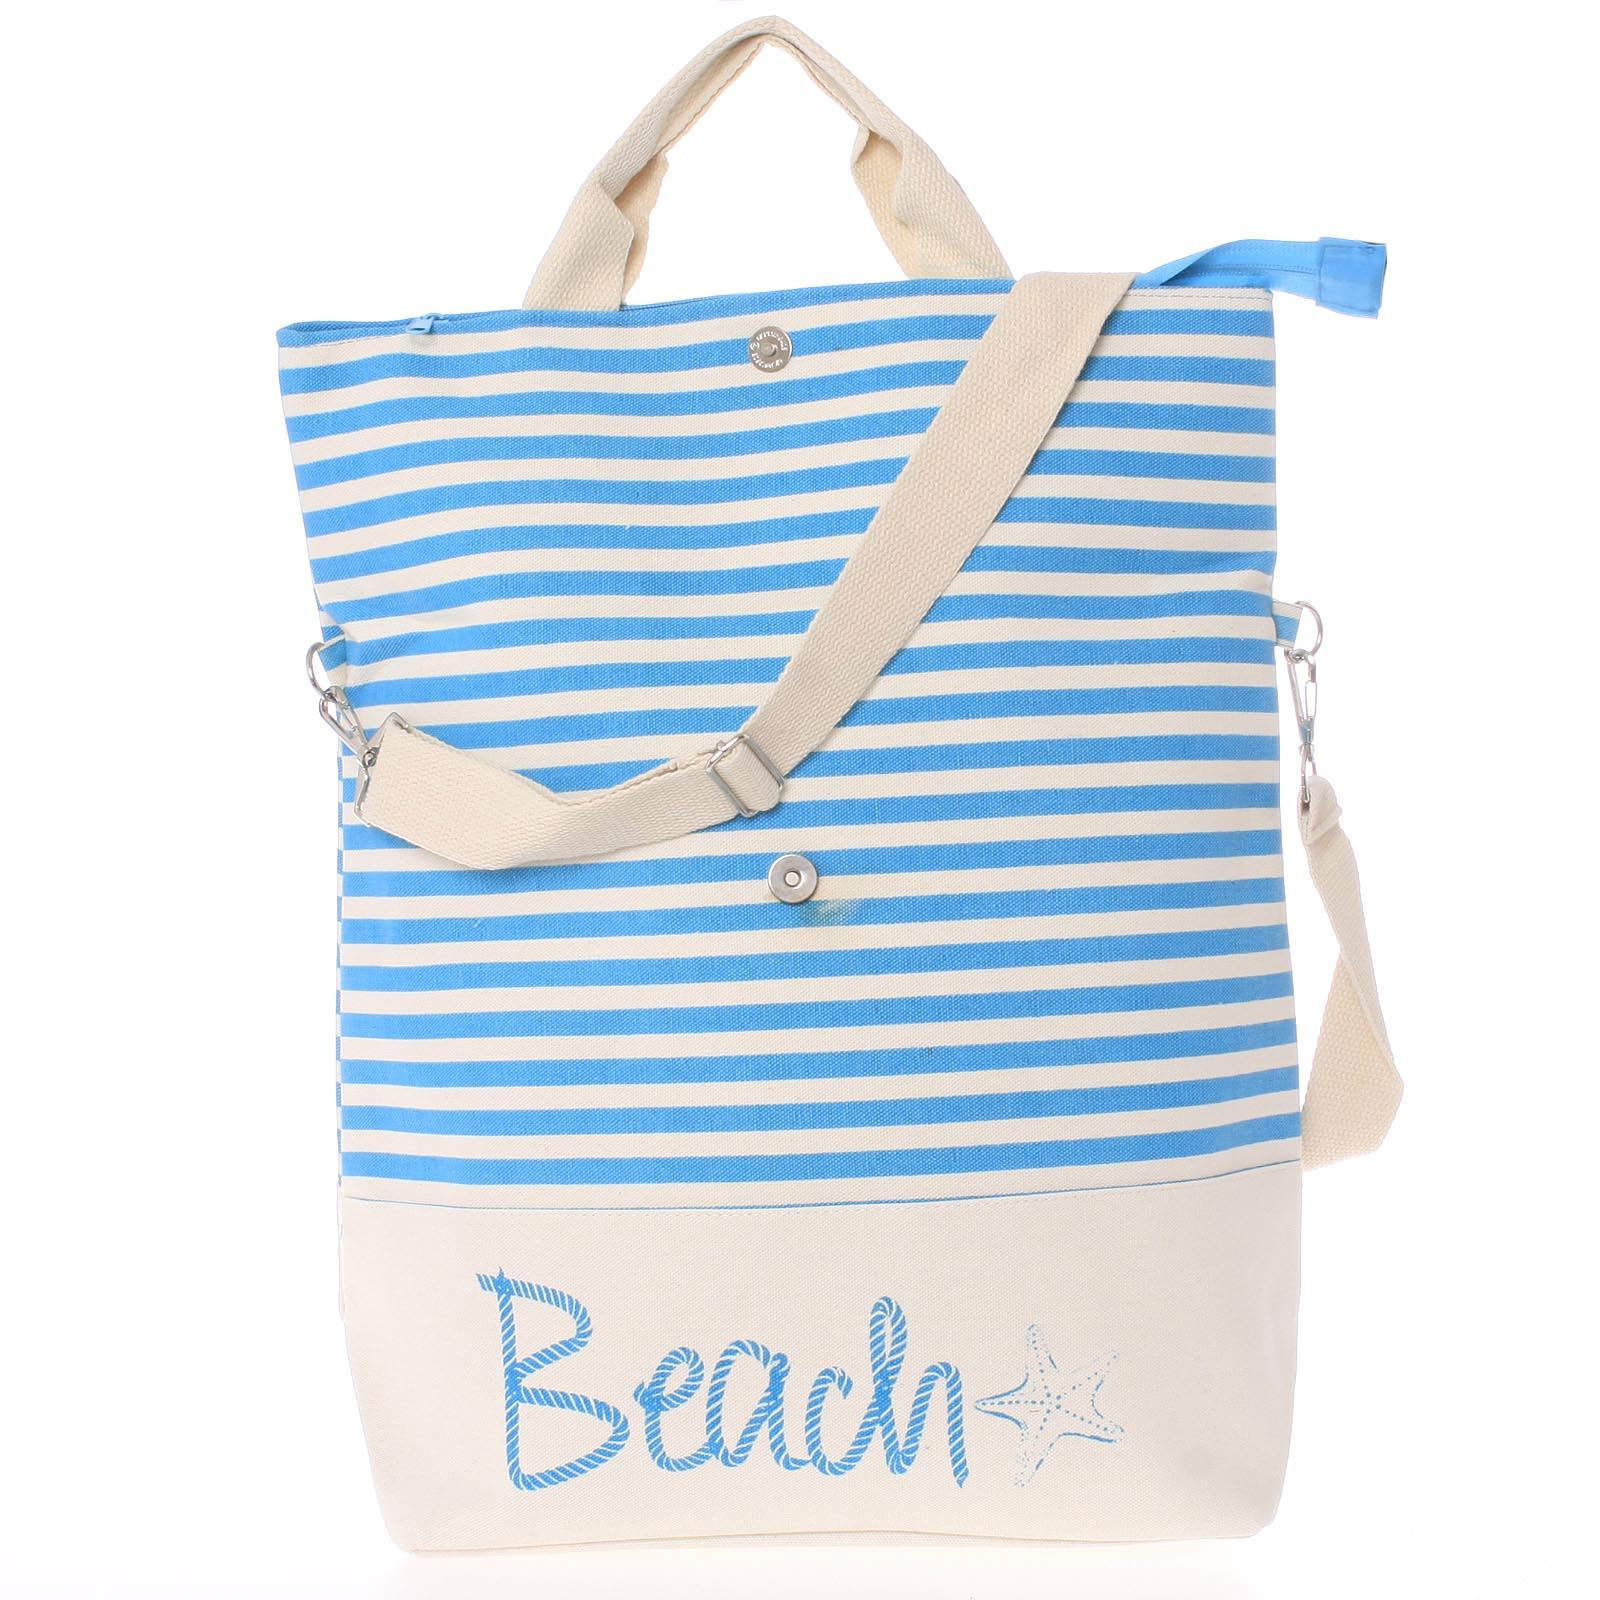 Plážová taška Beach světle modrá - Delami Star